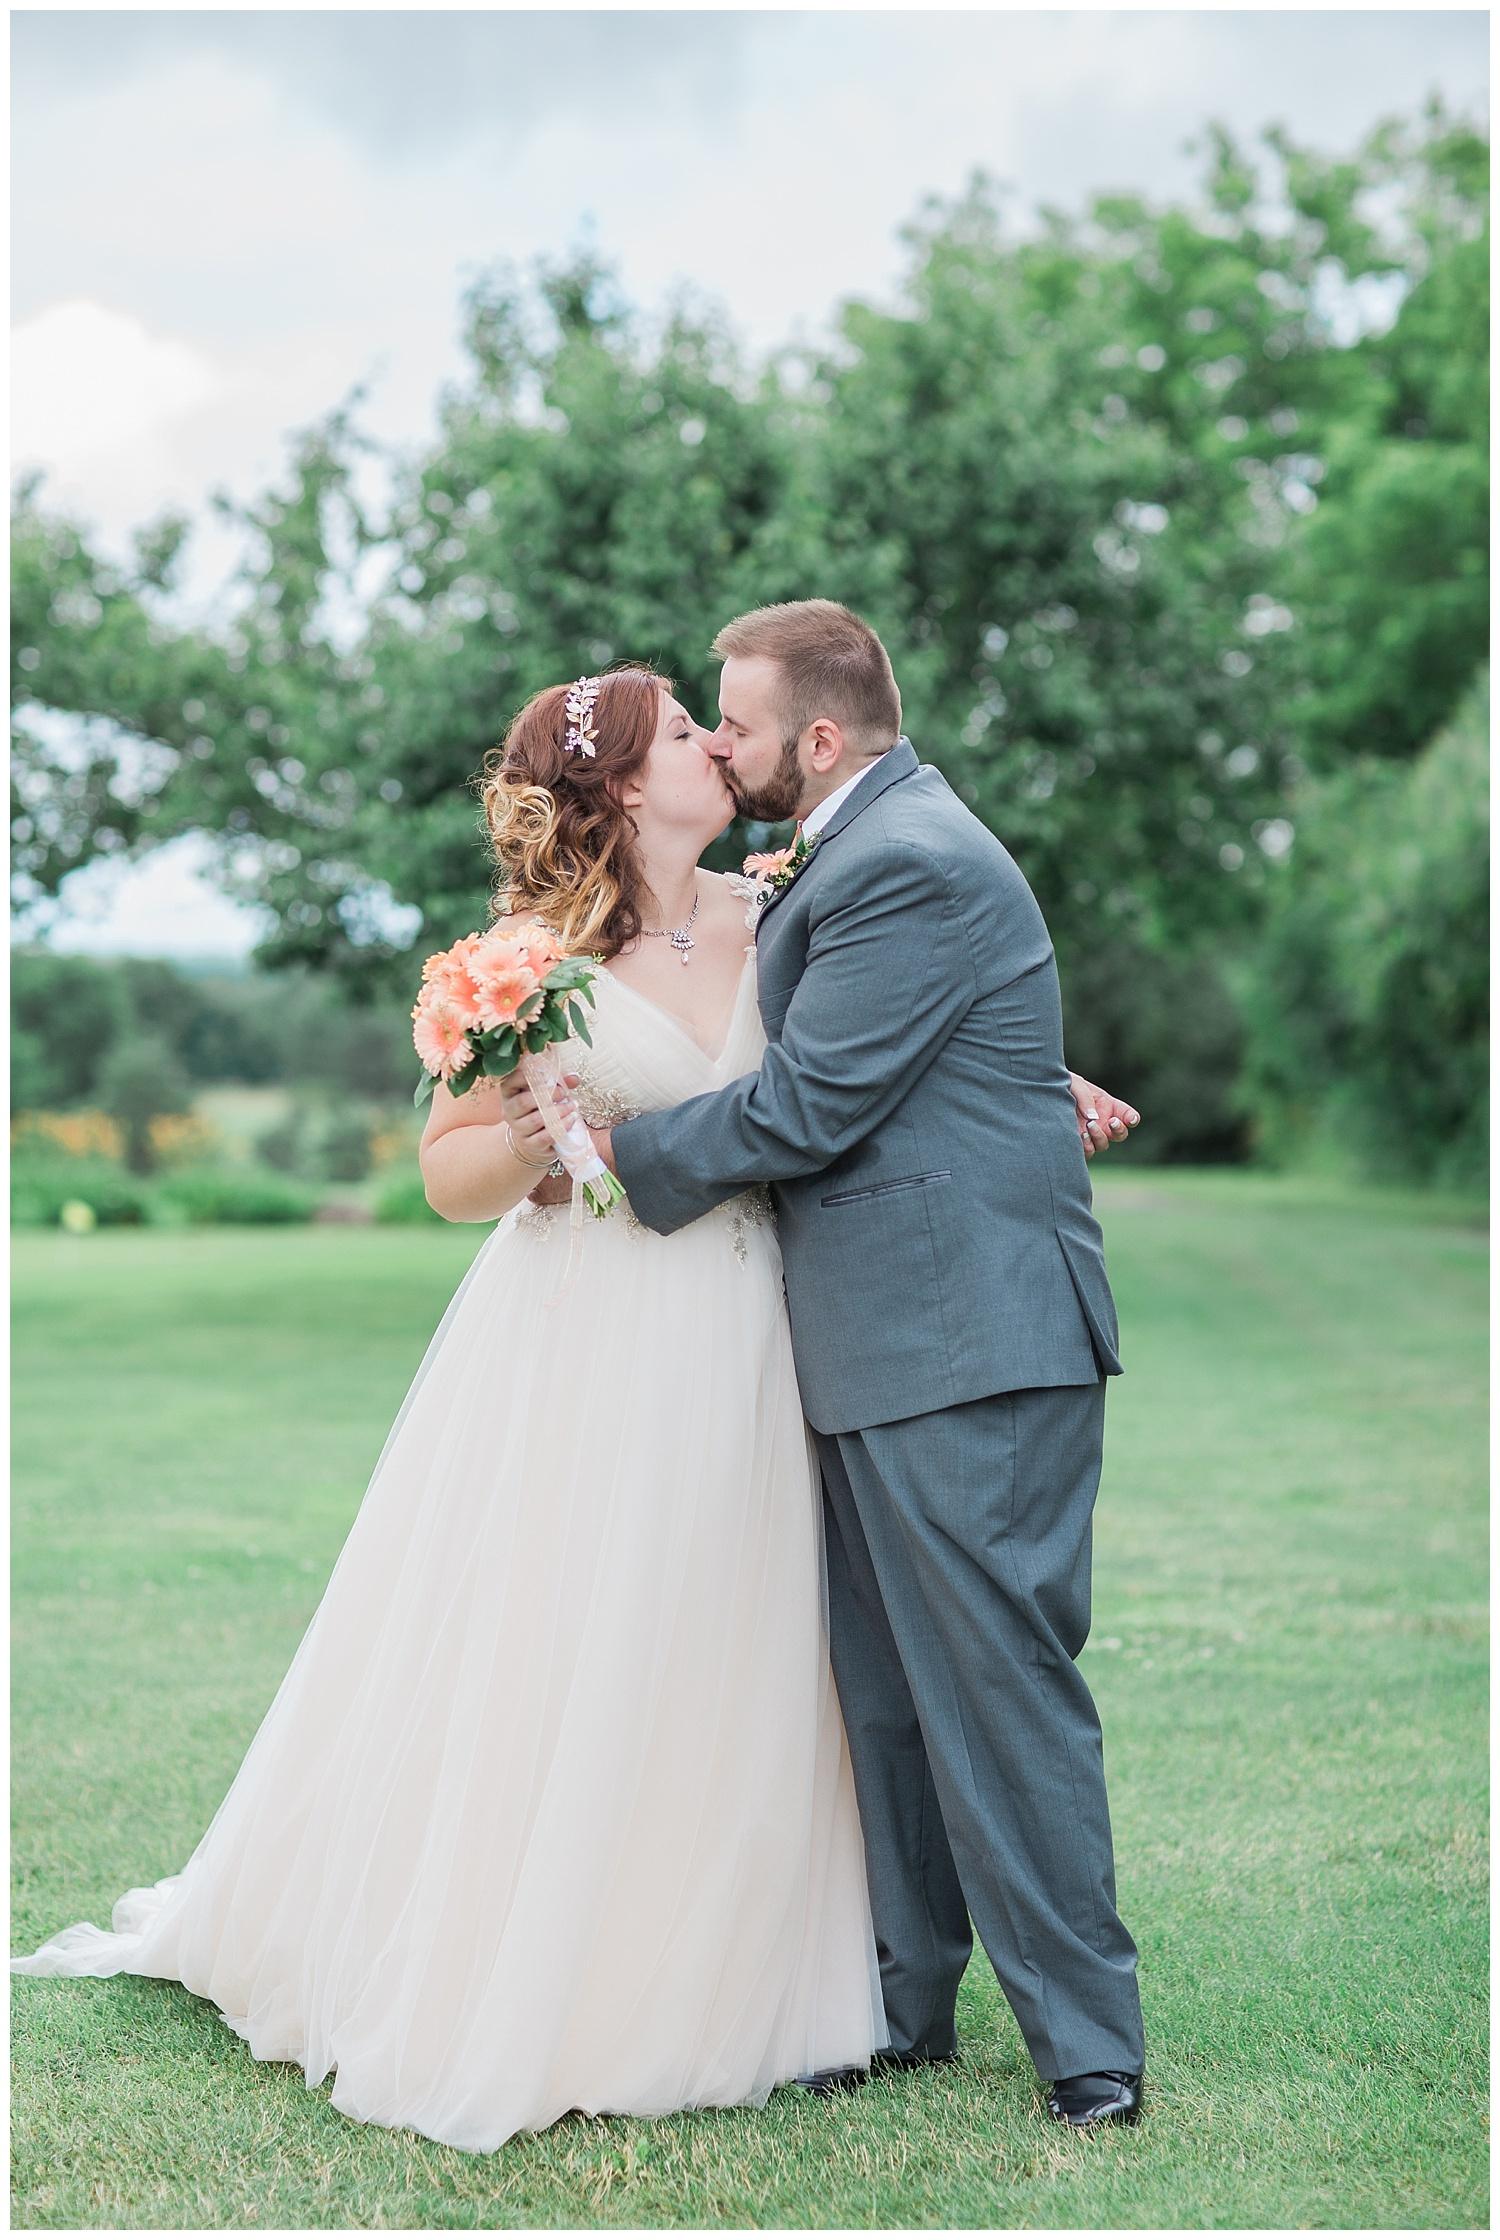 Brian and Molly Wed in Conesus NY - Lass & Beau-416_Buffalo wedding photography.jpg